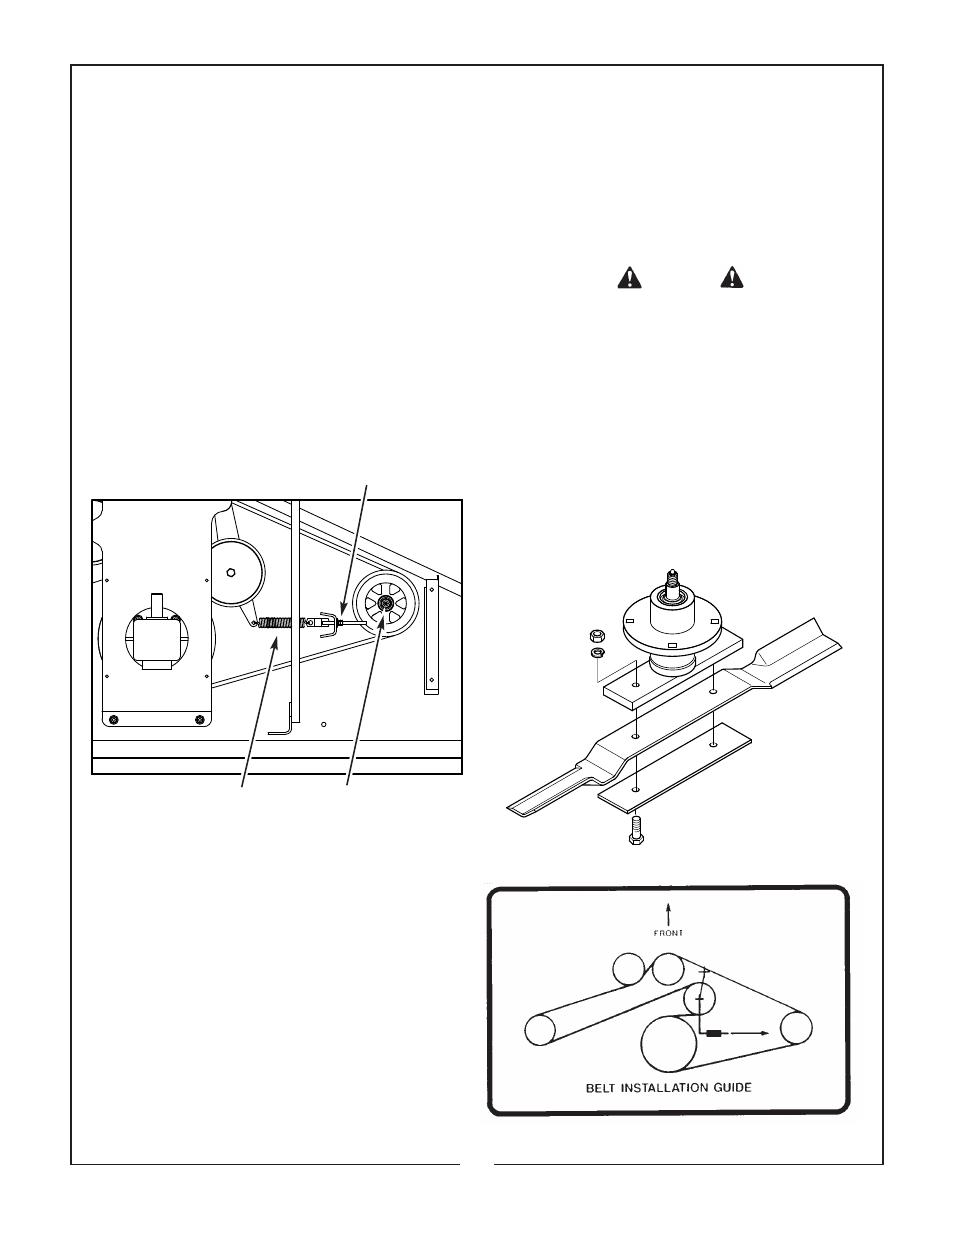 Bush Hog Air Tunnel Finishing Mower Ath 900 User Manual